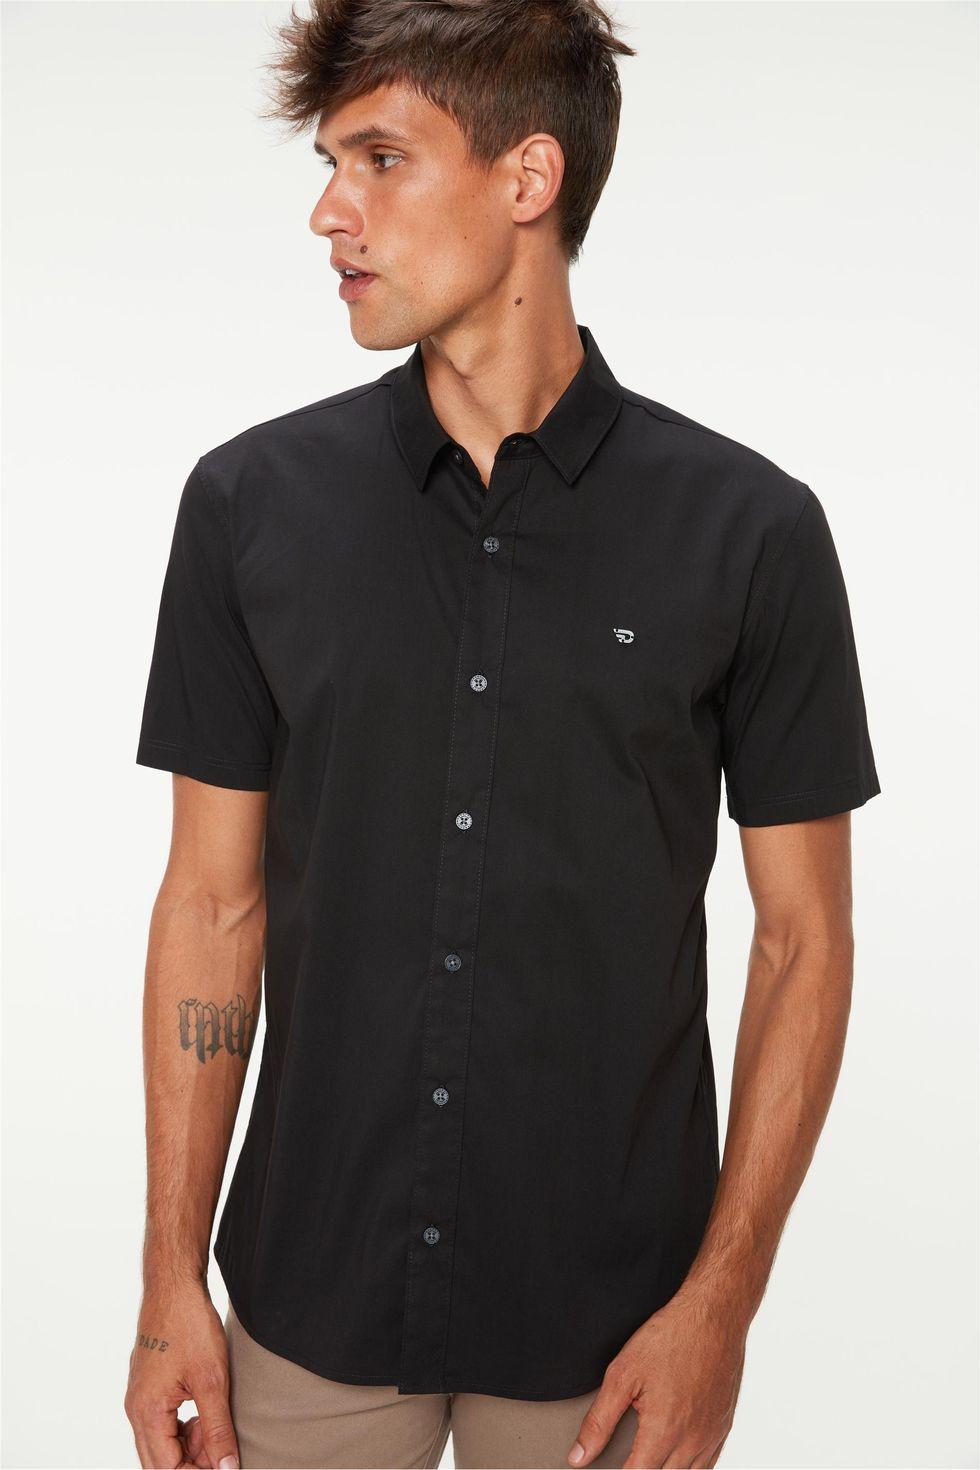 camisa-manga-curta-lisa-masculina-Frente--